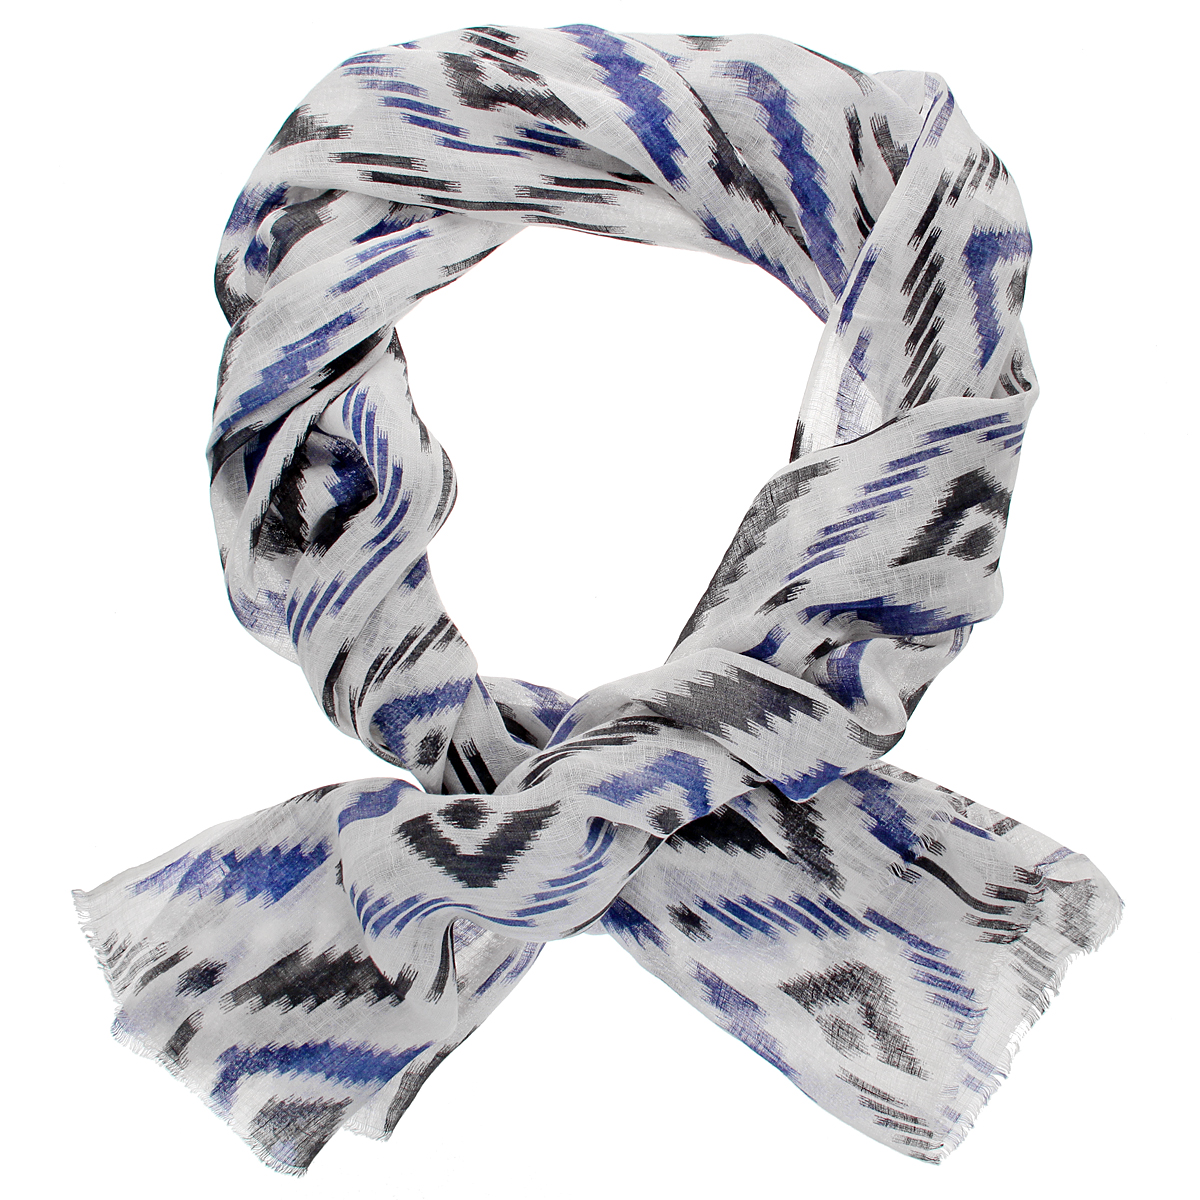 Палантин Ethnica, цвет: белый, синий, темно-серый. 001450s. Размер 70 см х 200 см